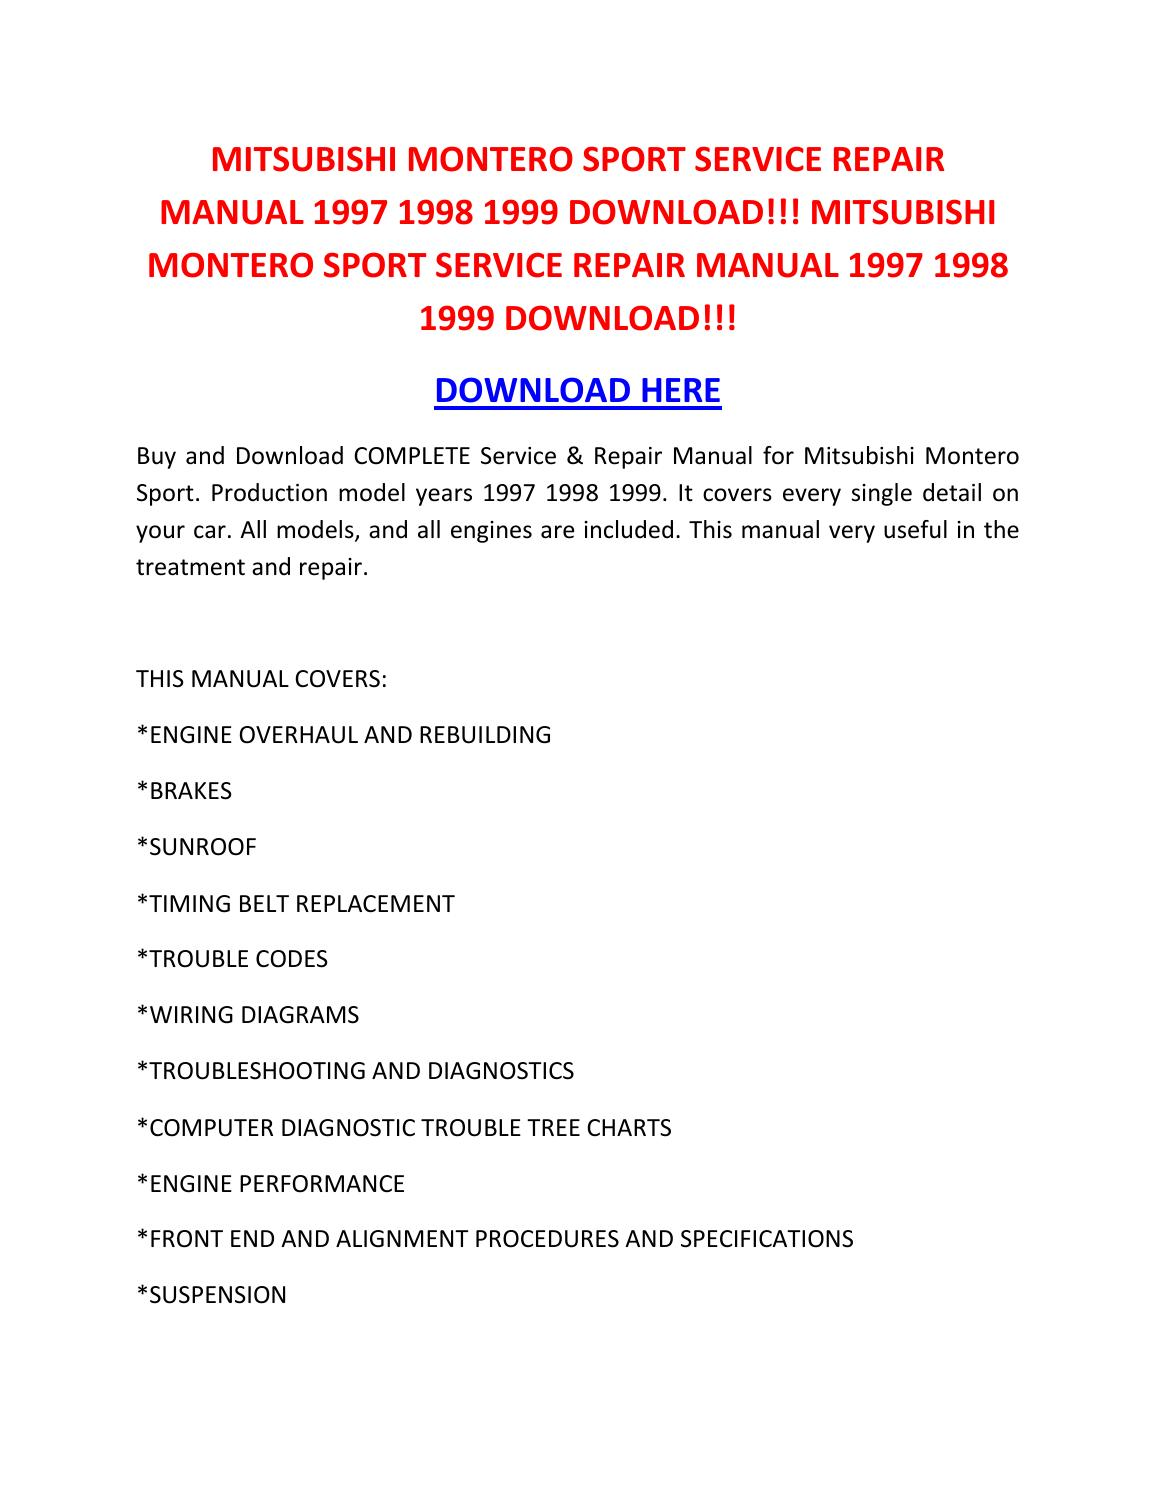 Shop Manual Mitsubishi Montero Sport Service Repair Manual